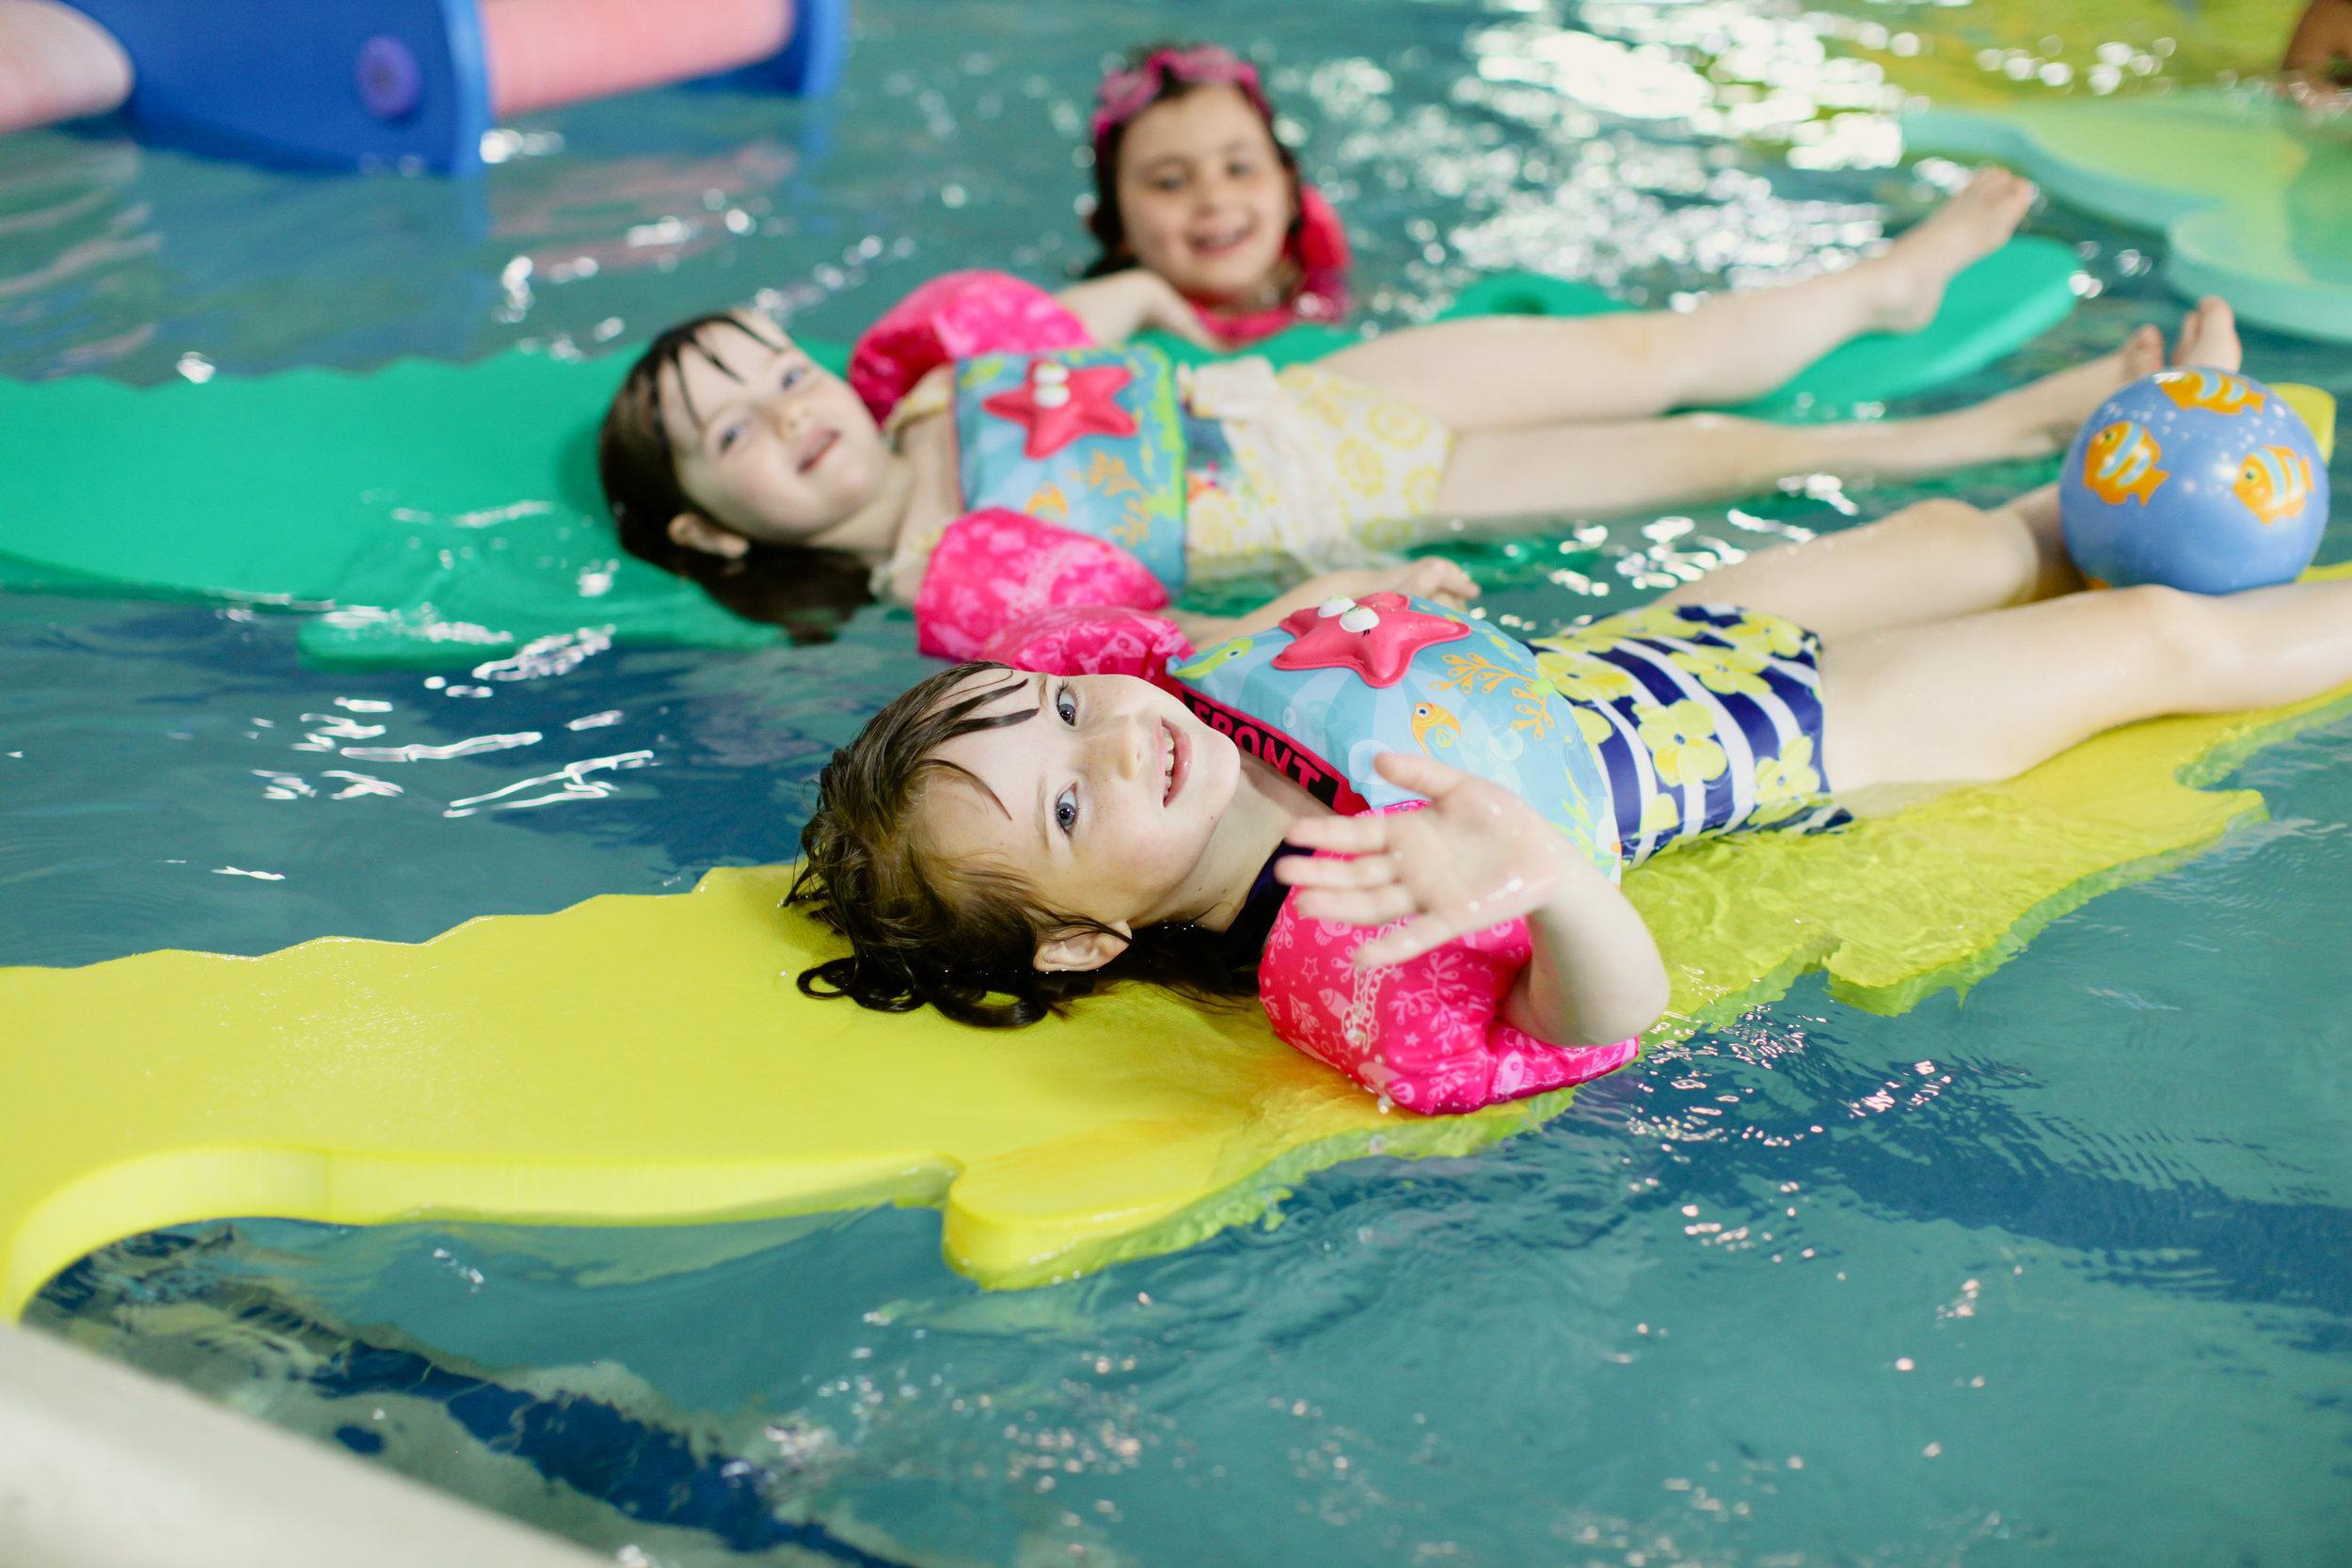 Goldfish-Swim-School-Dublin-Ohio-Make-A-Wish-02